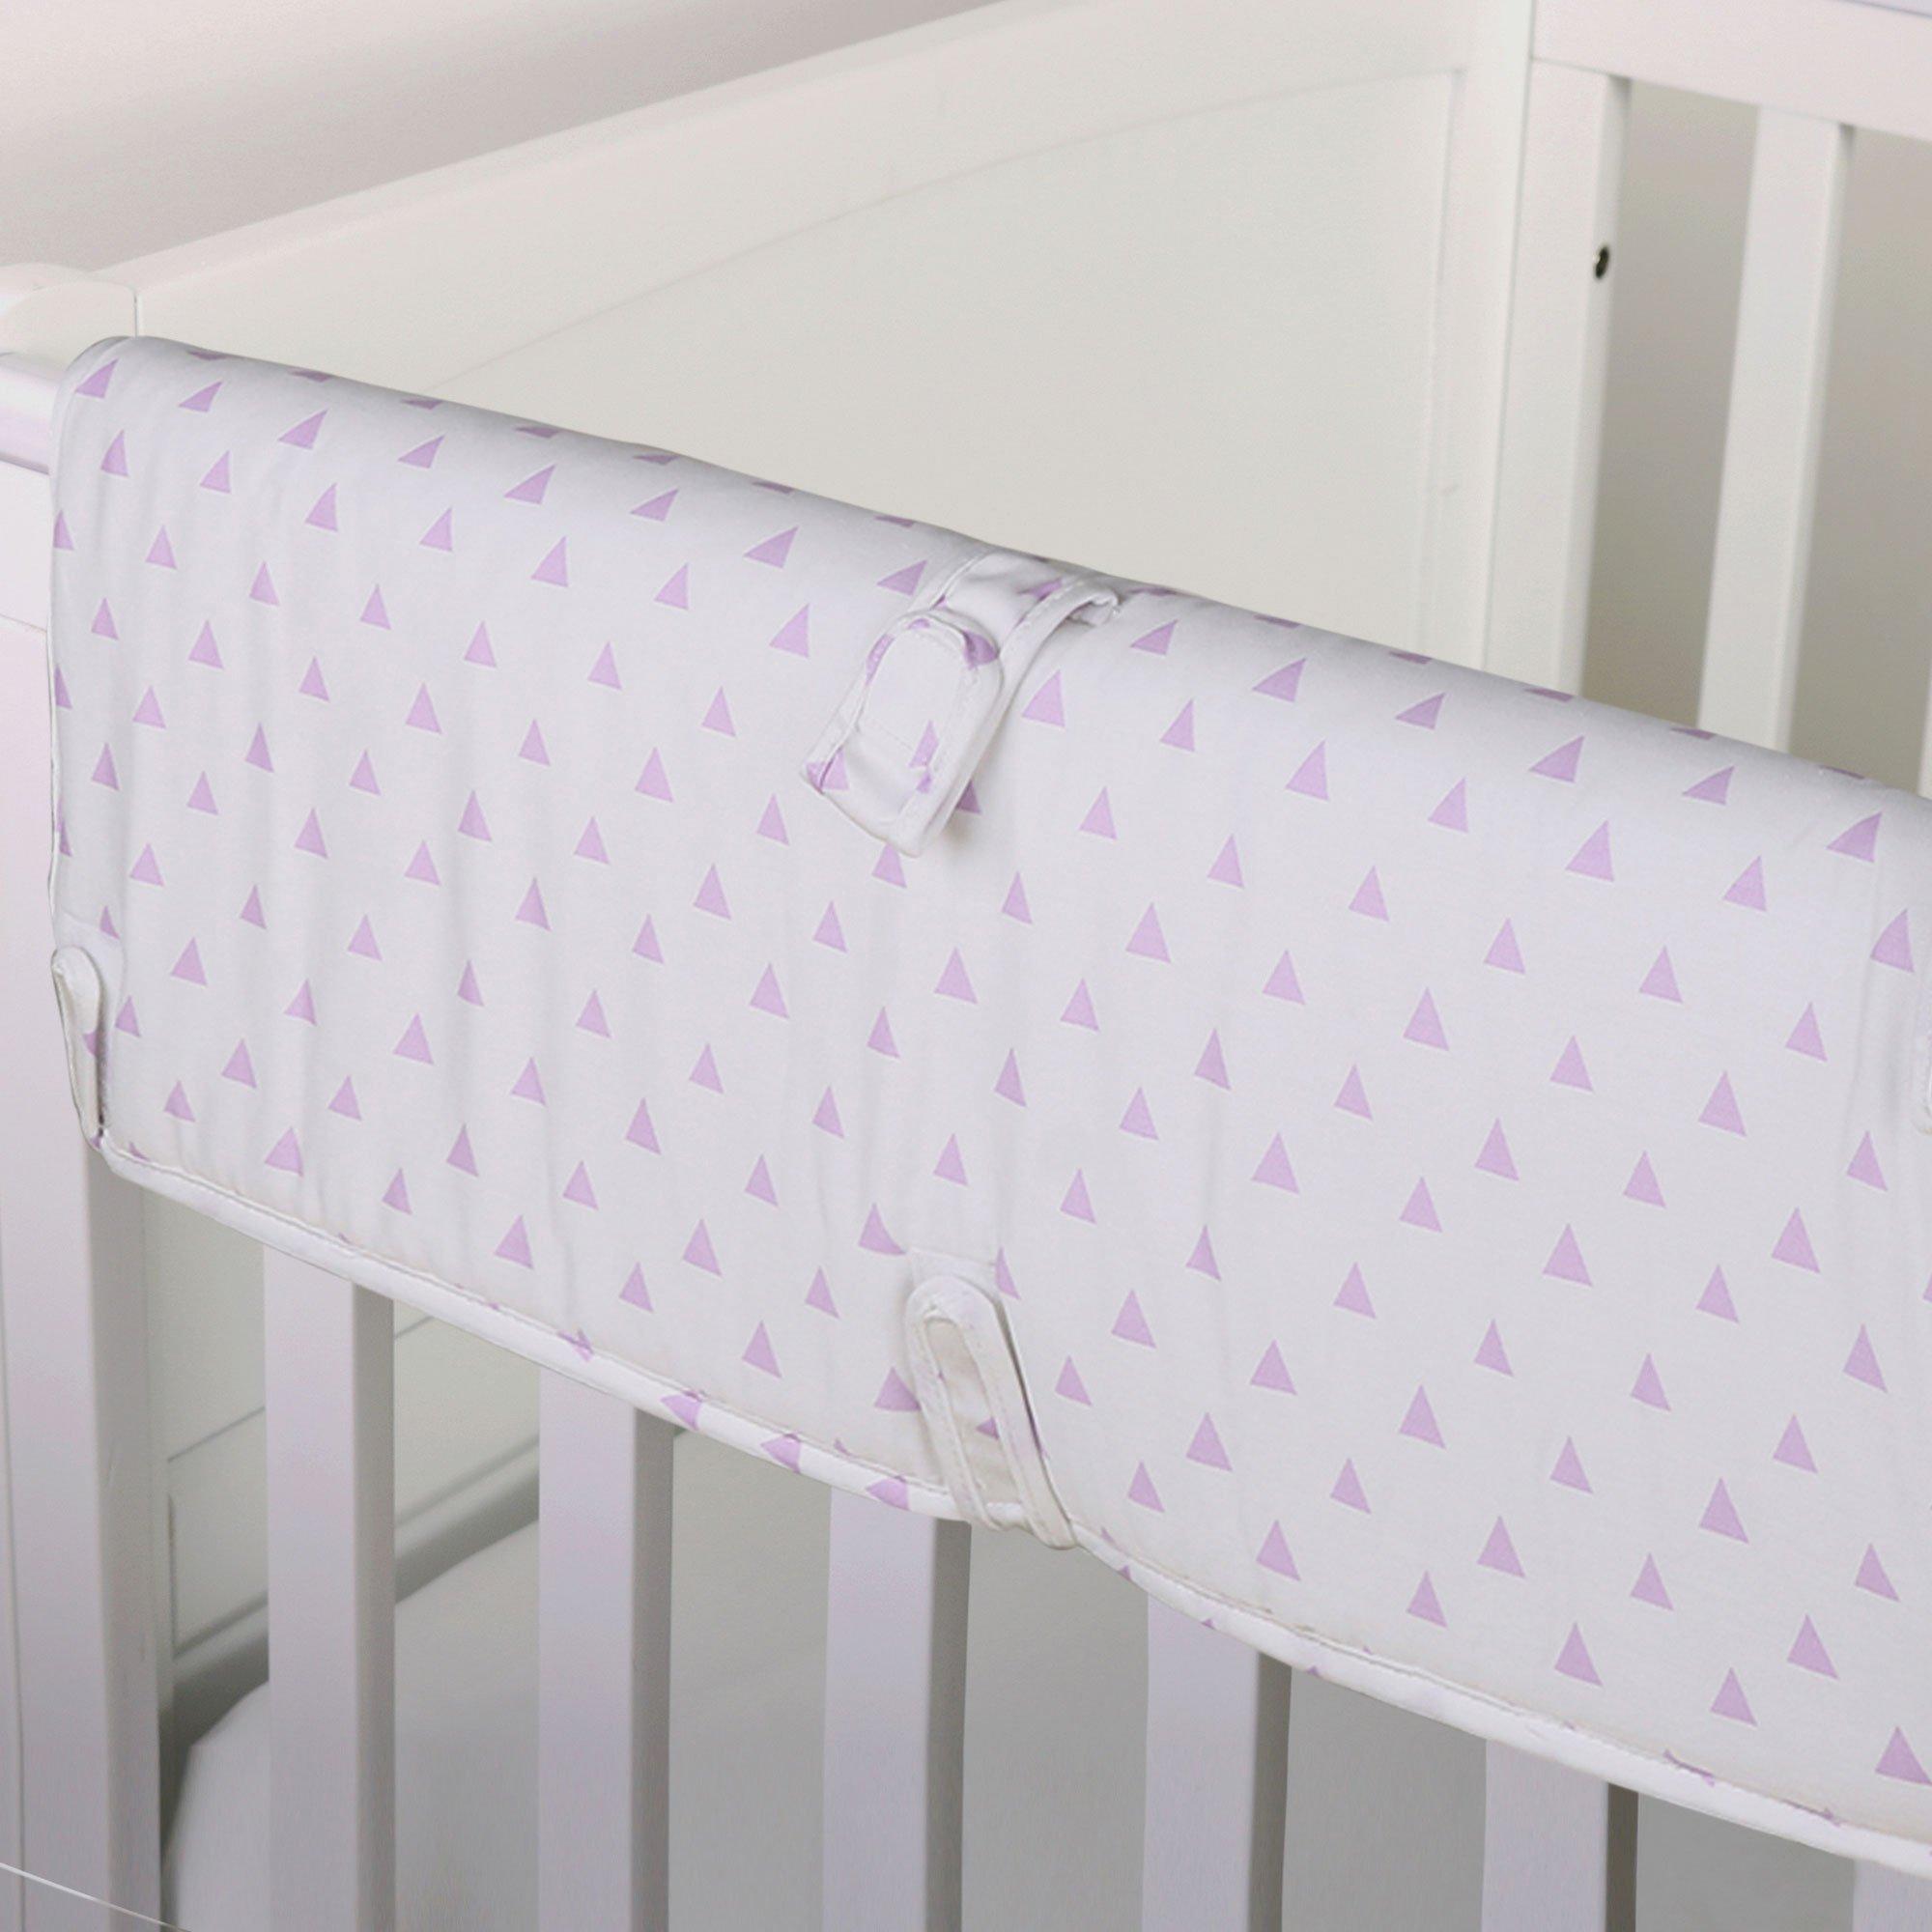 Purple Triangle Print 100% Cotton Padded Crib Rail Guard by The Peanut Shell